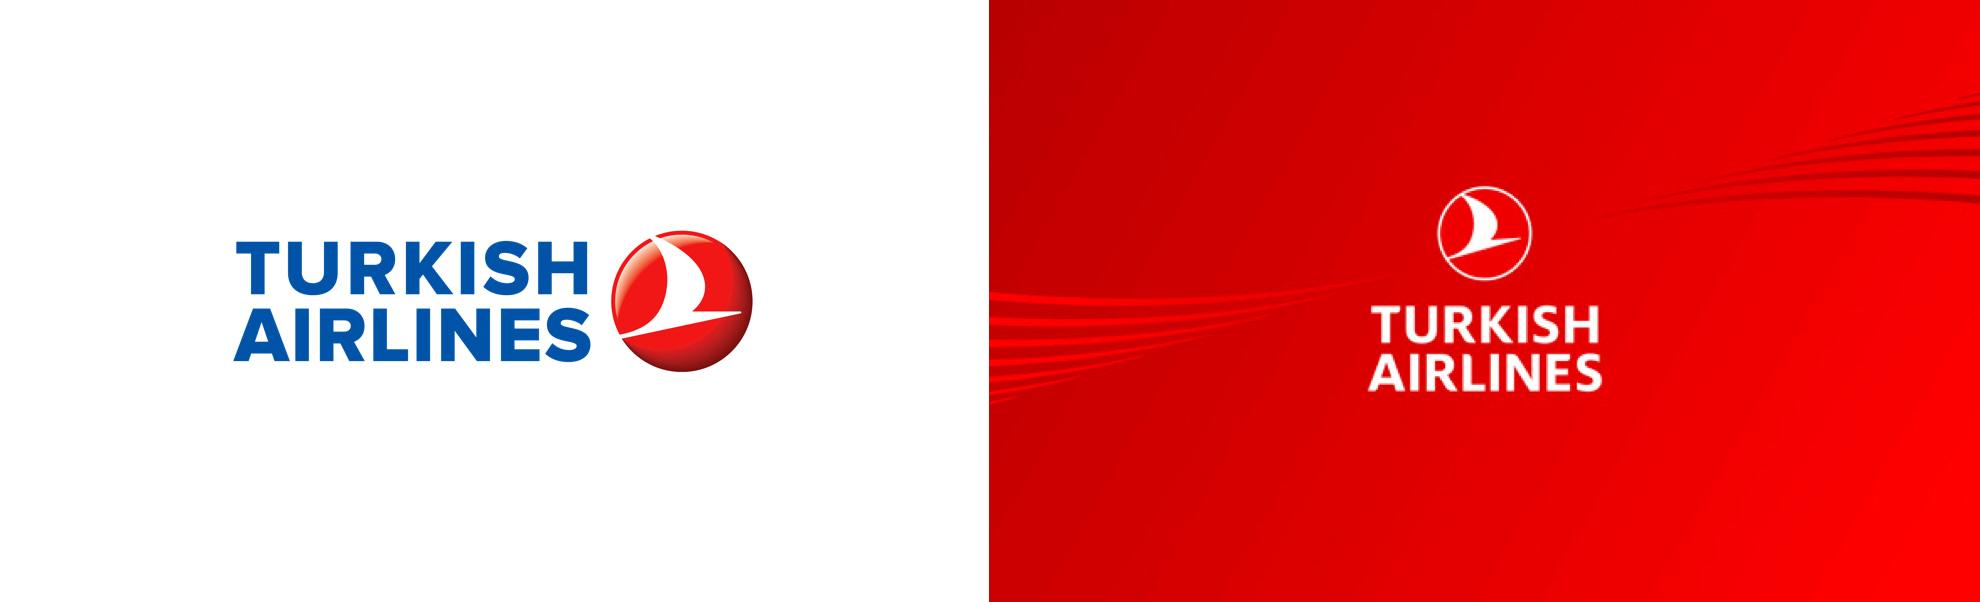 turkish airlines nowe istare logo